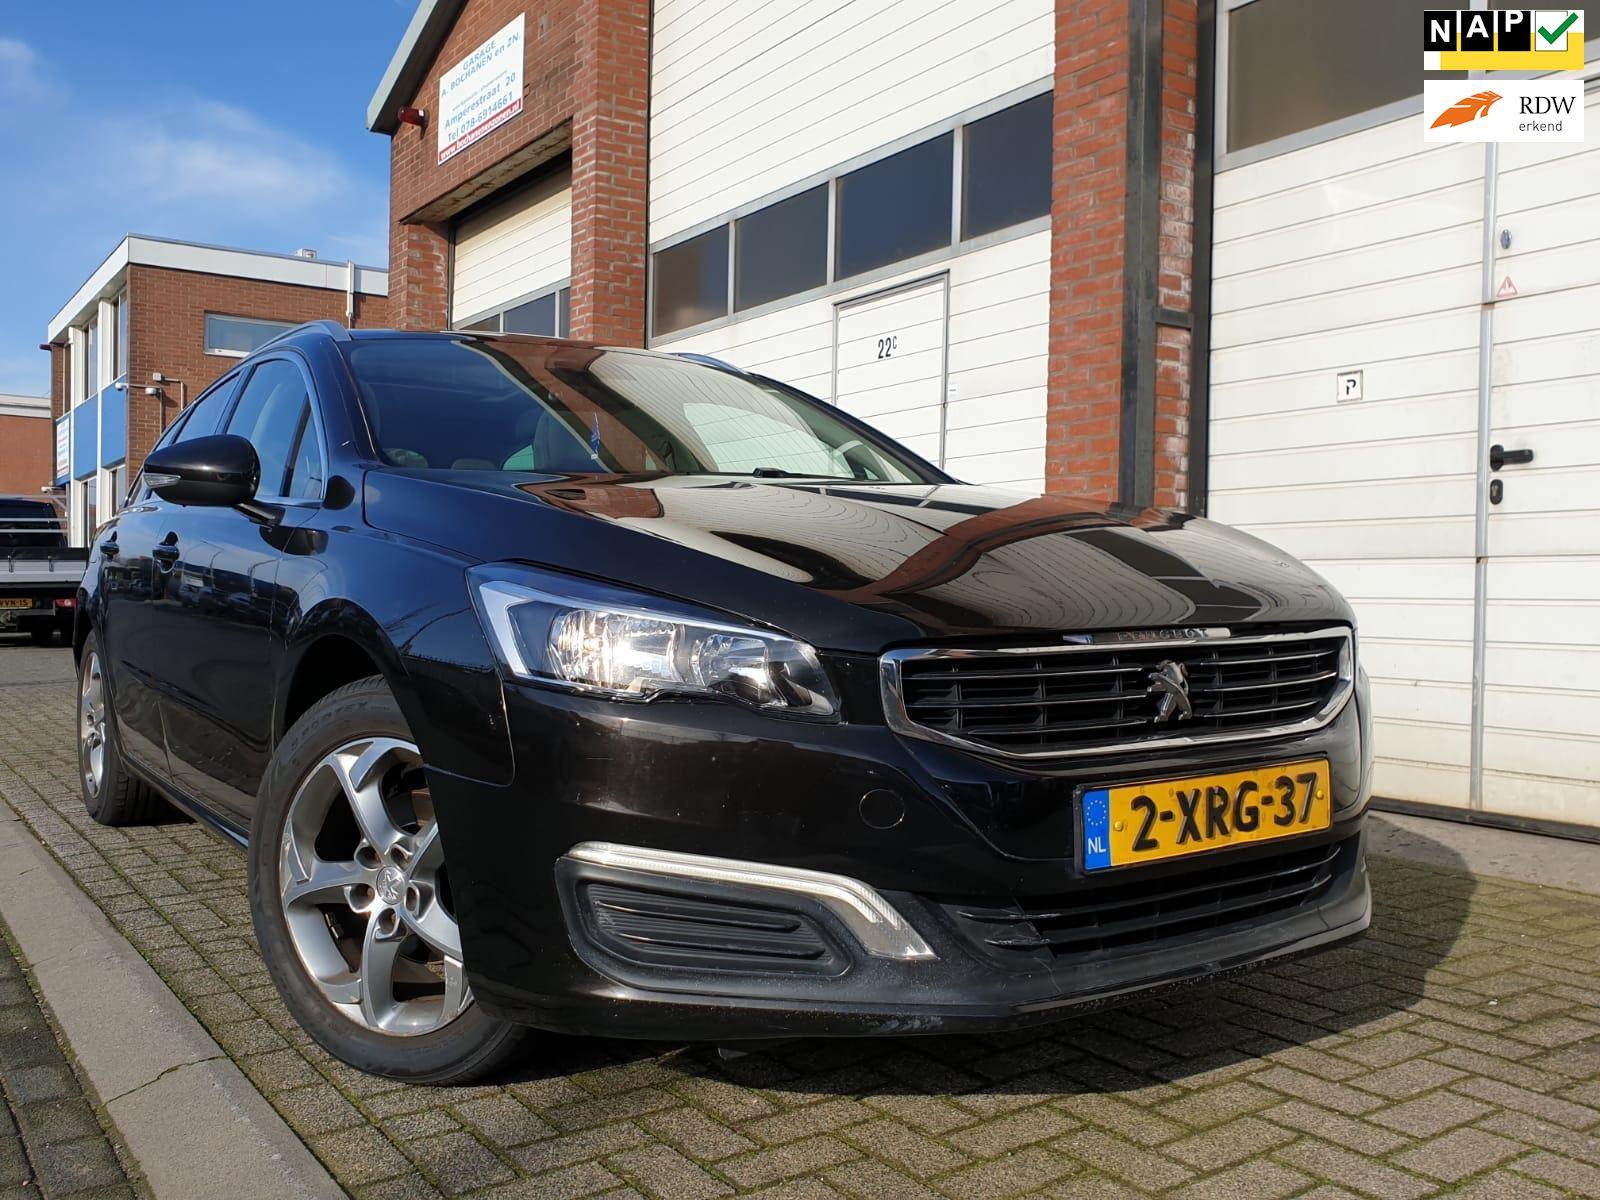 Peugeot 508 SW occasion - Auto Noordbrug BV